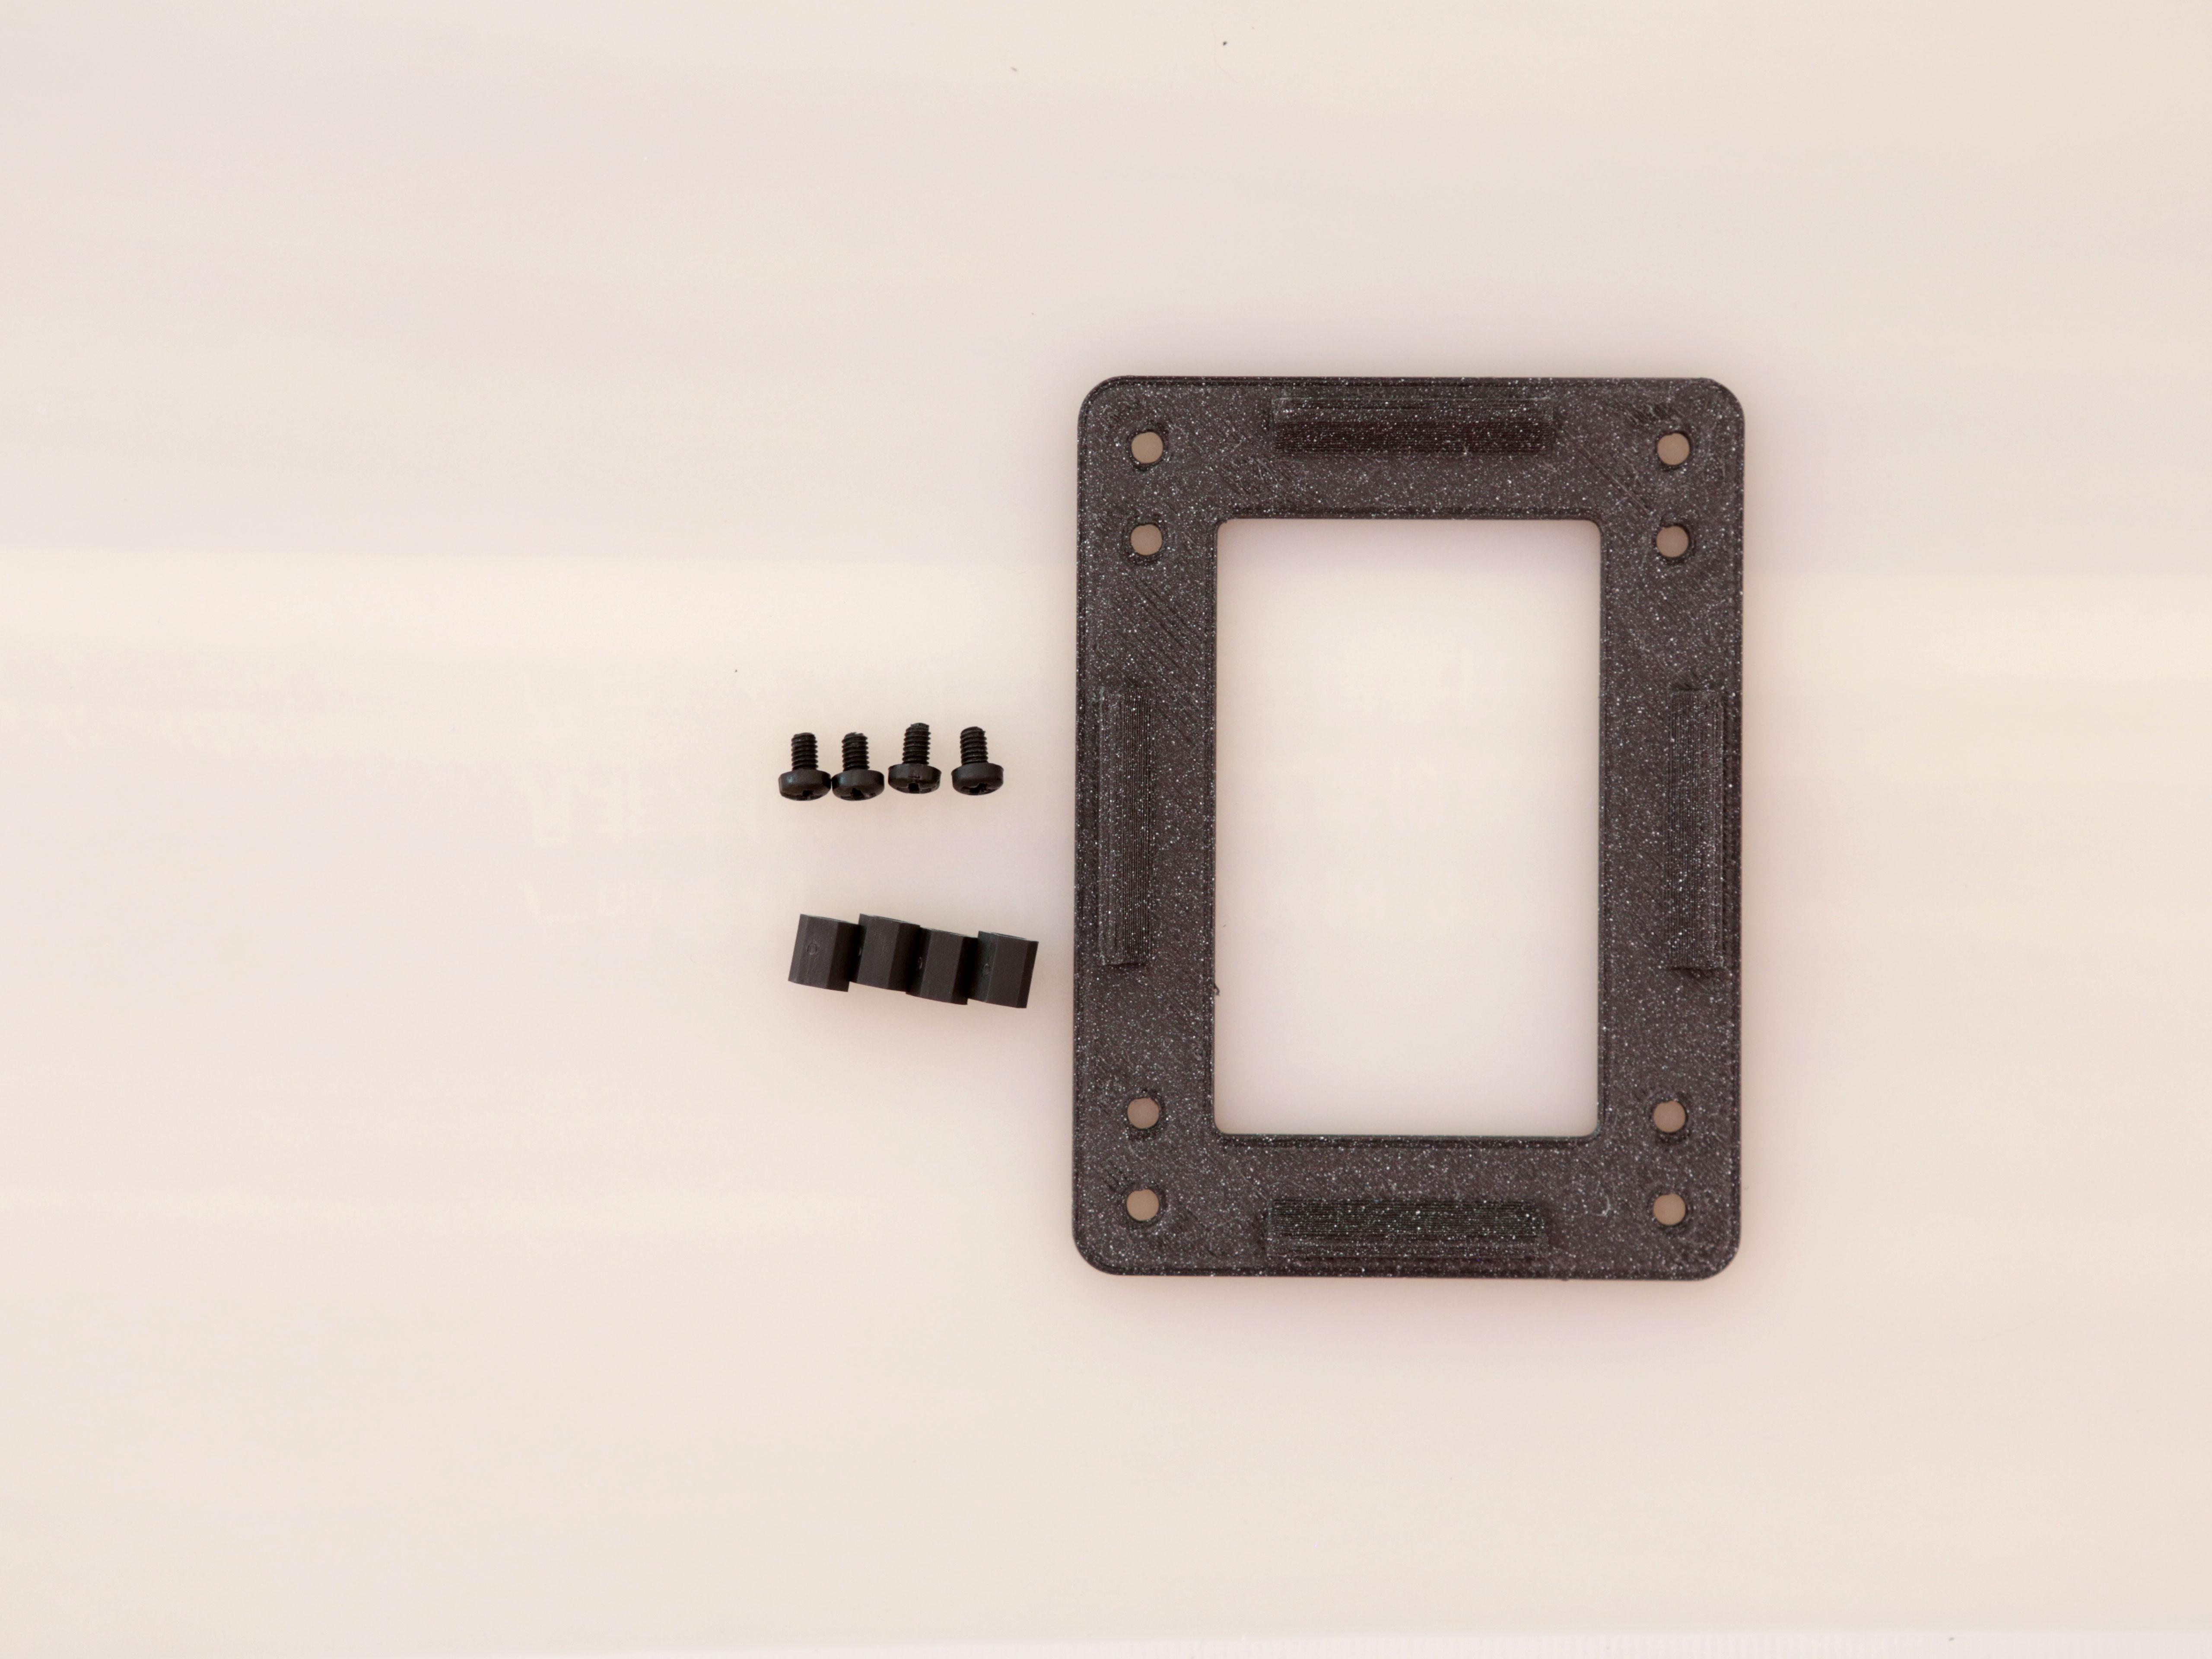 3d_printing_case-bot-screws.jpg